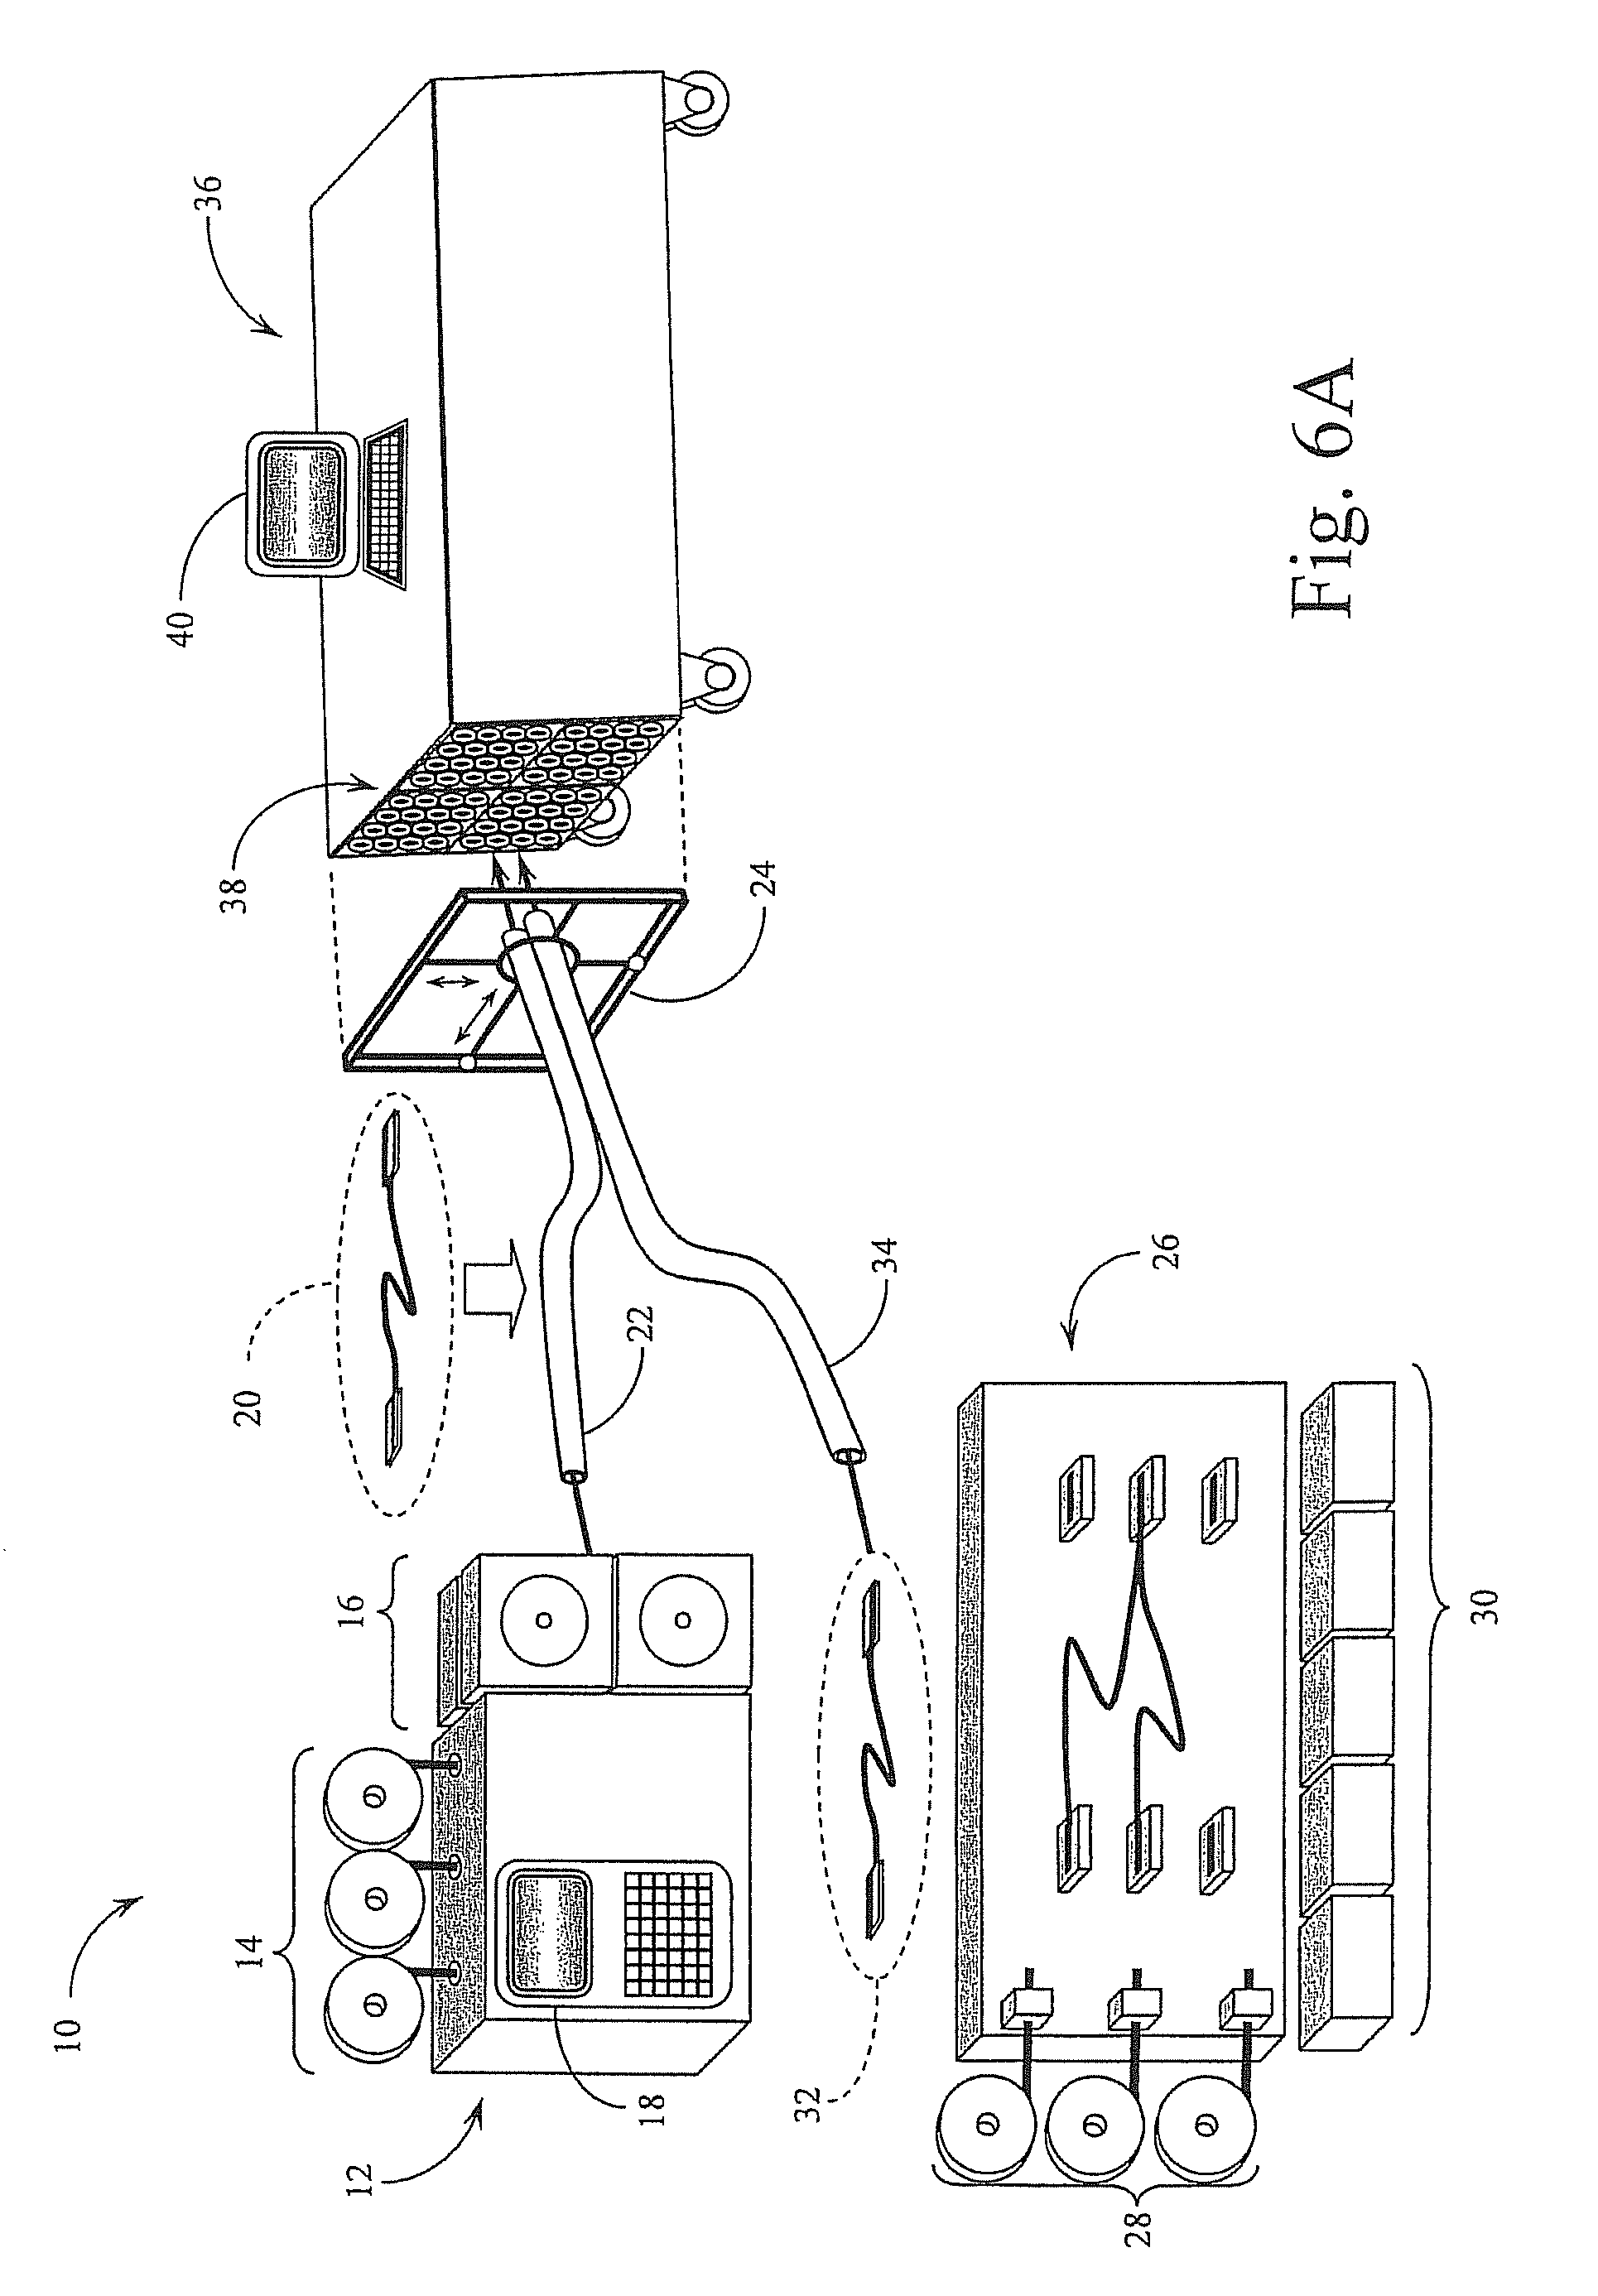 Amp Wiring For 1998 Bmw E39 Gentex Ztvhl3 Wiring-diagram Mirror